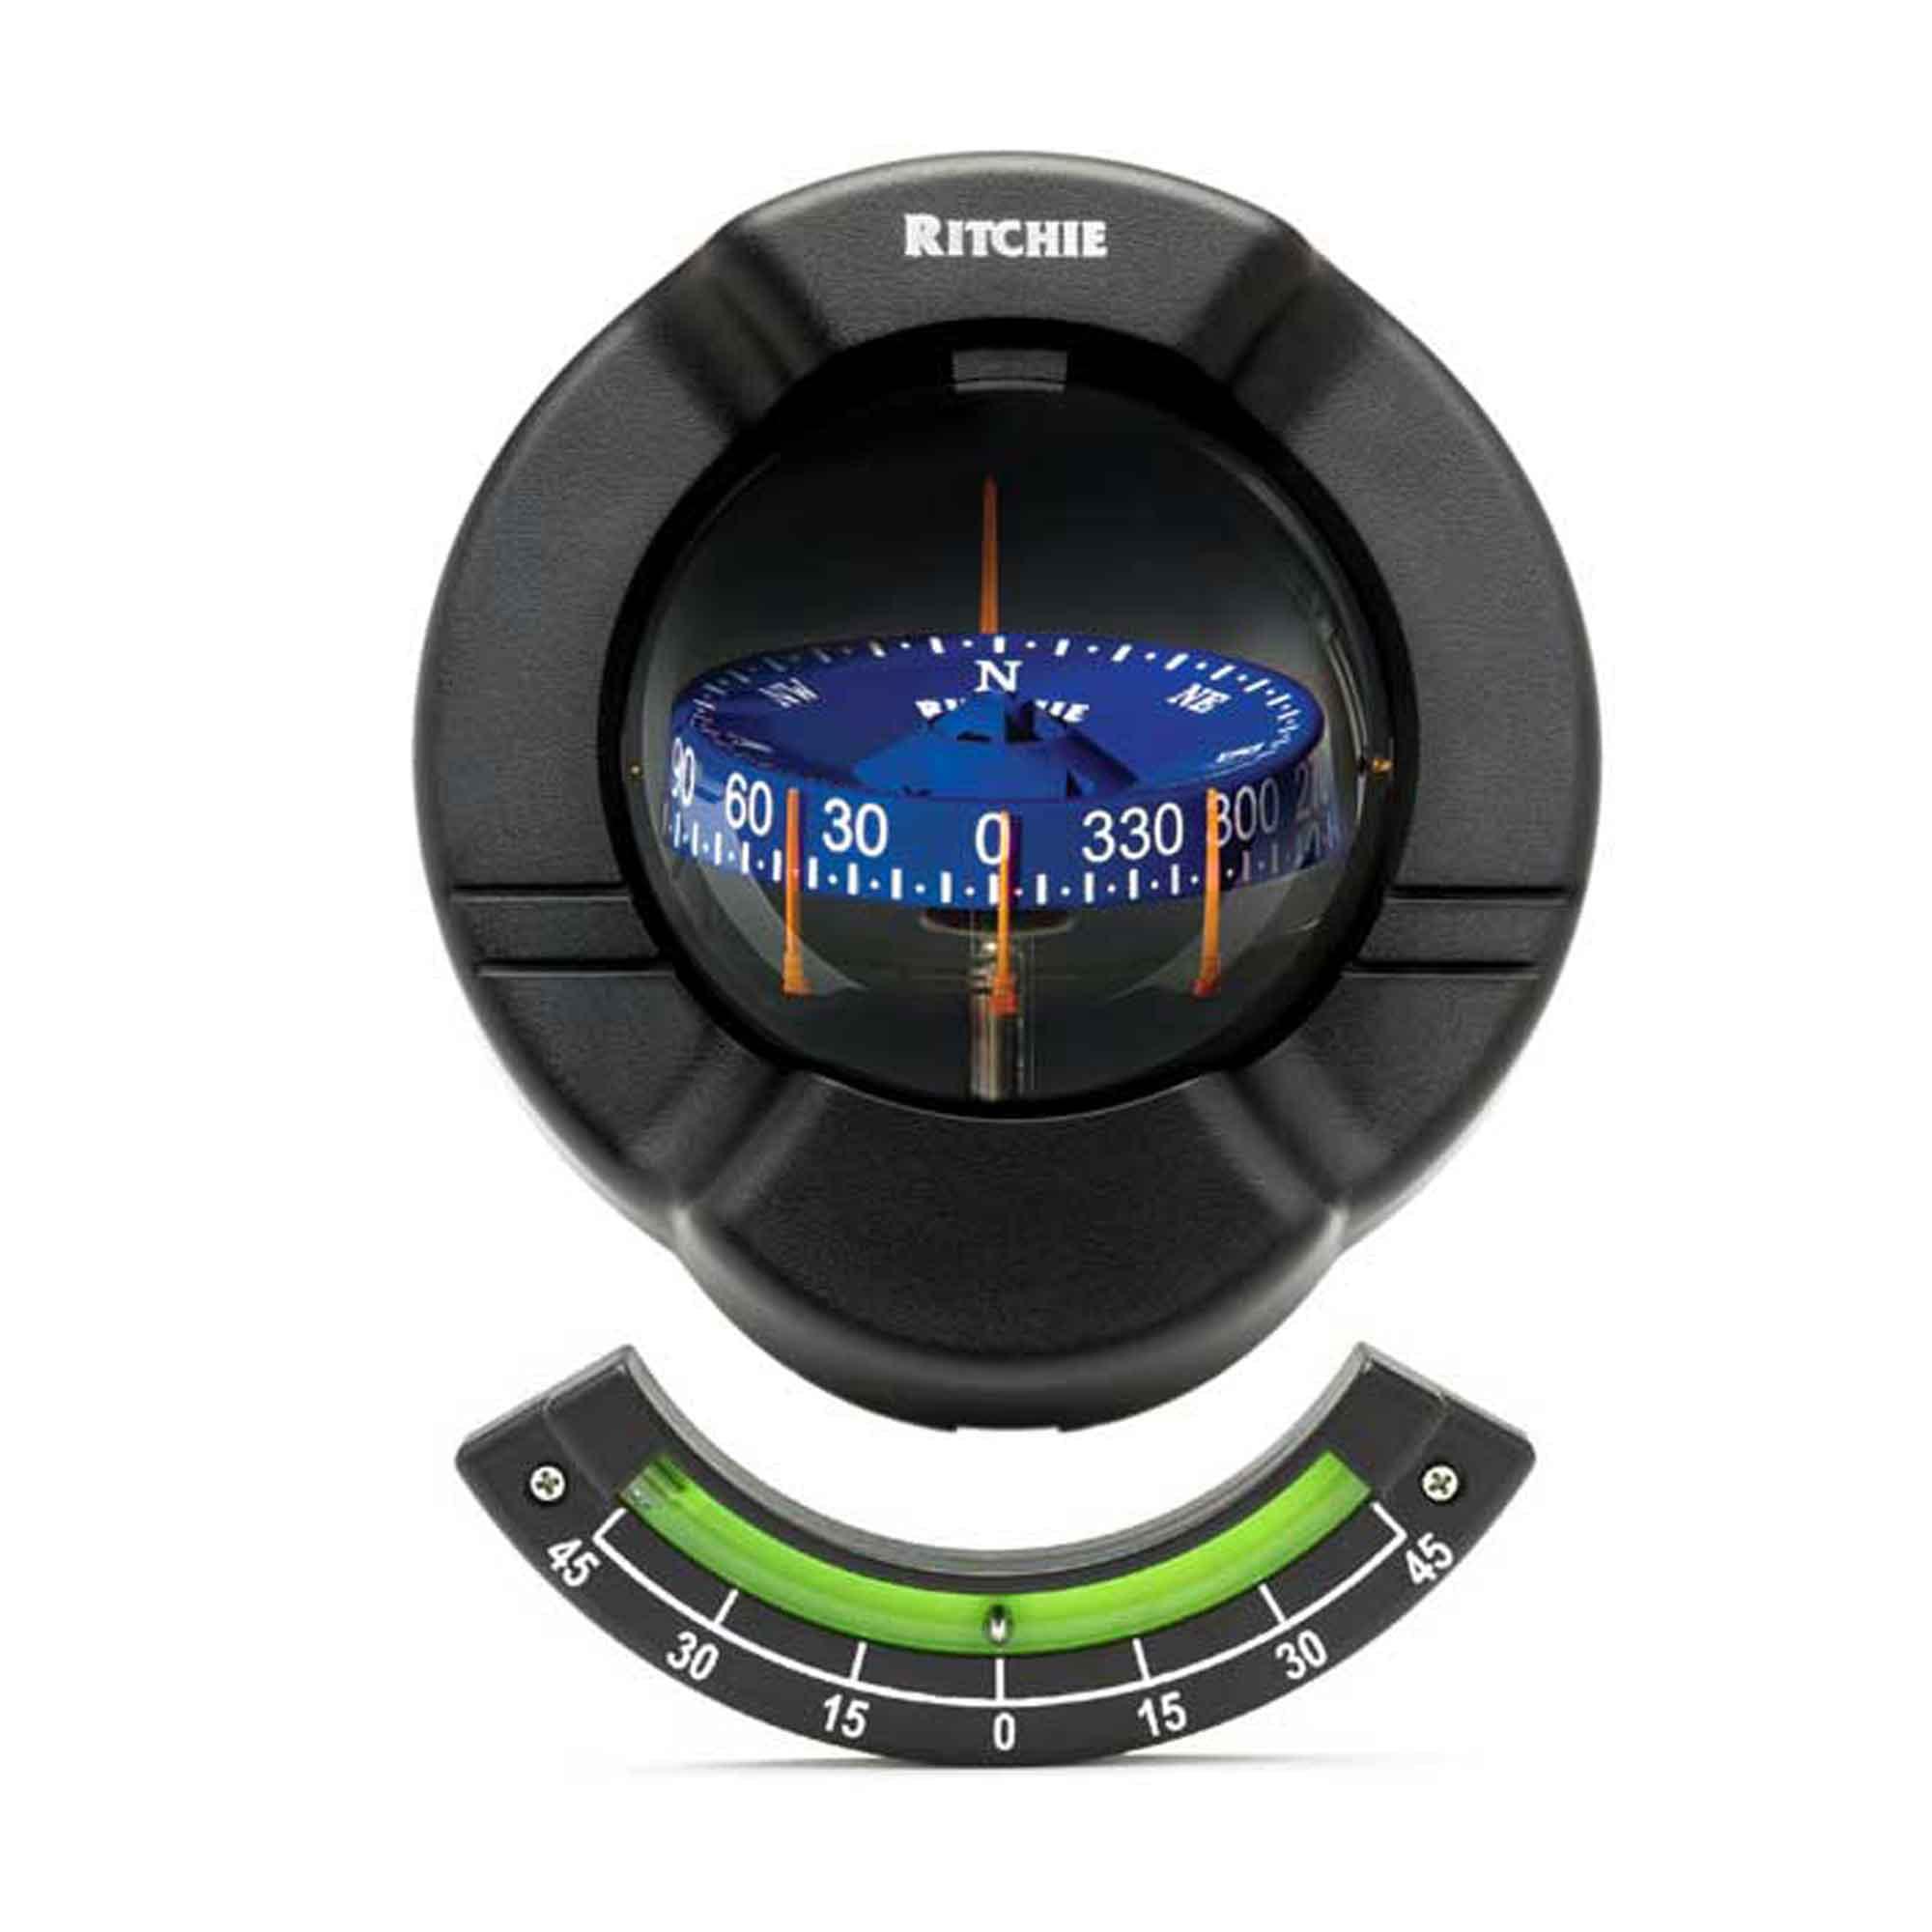 Sr2 Marine Venture Compass Bulkhead Mount for Sailboat - Ritchie FO-3237